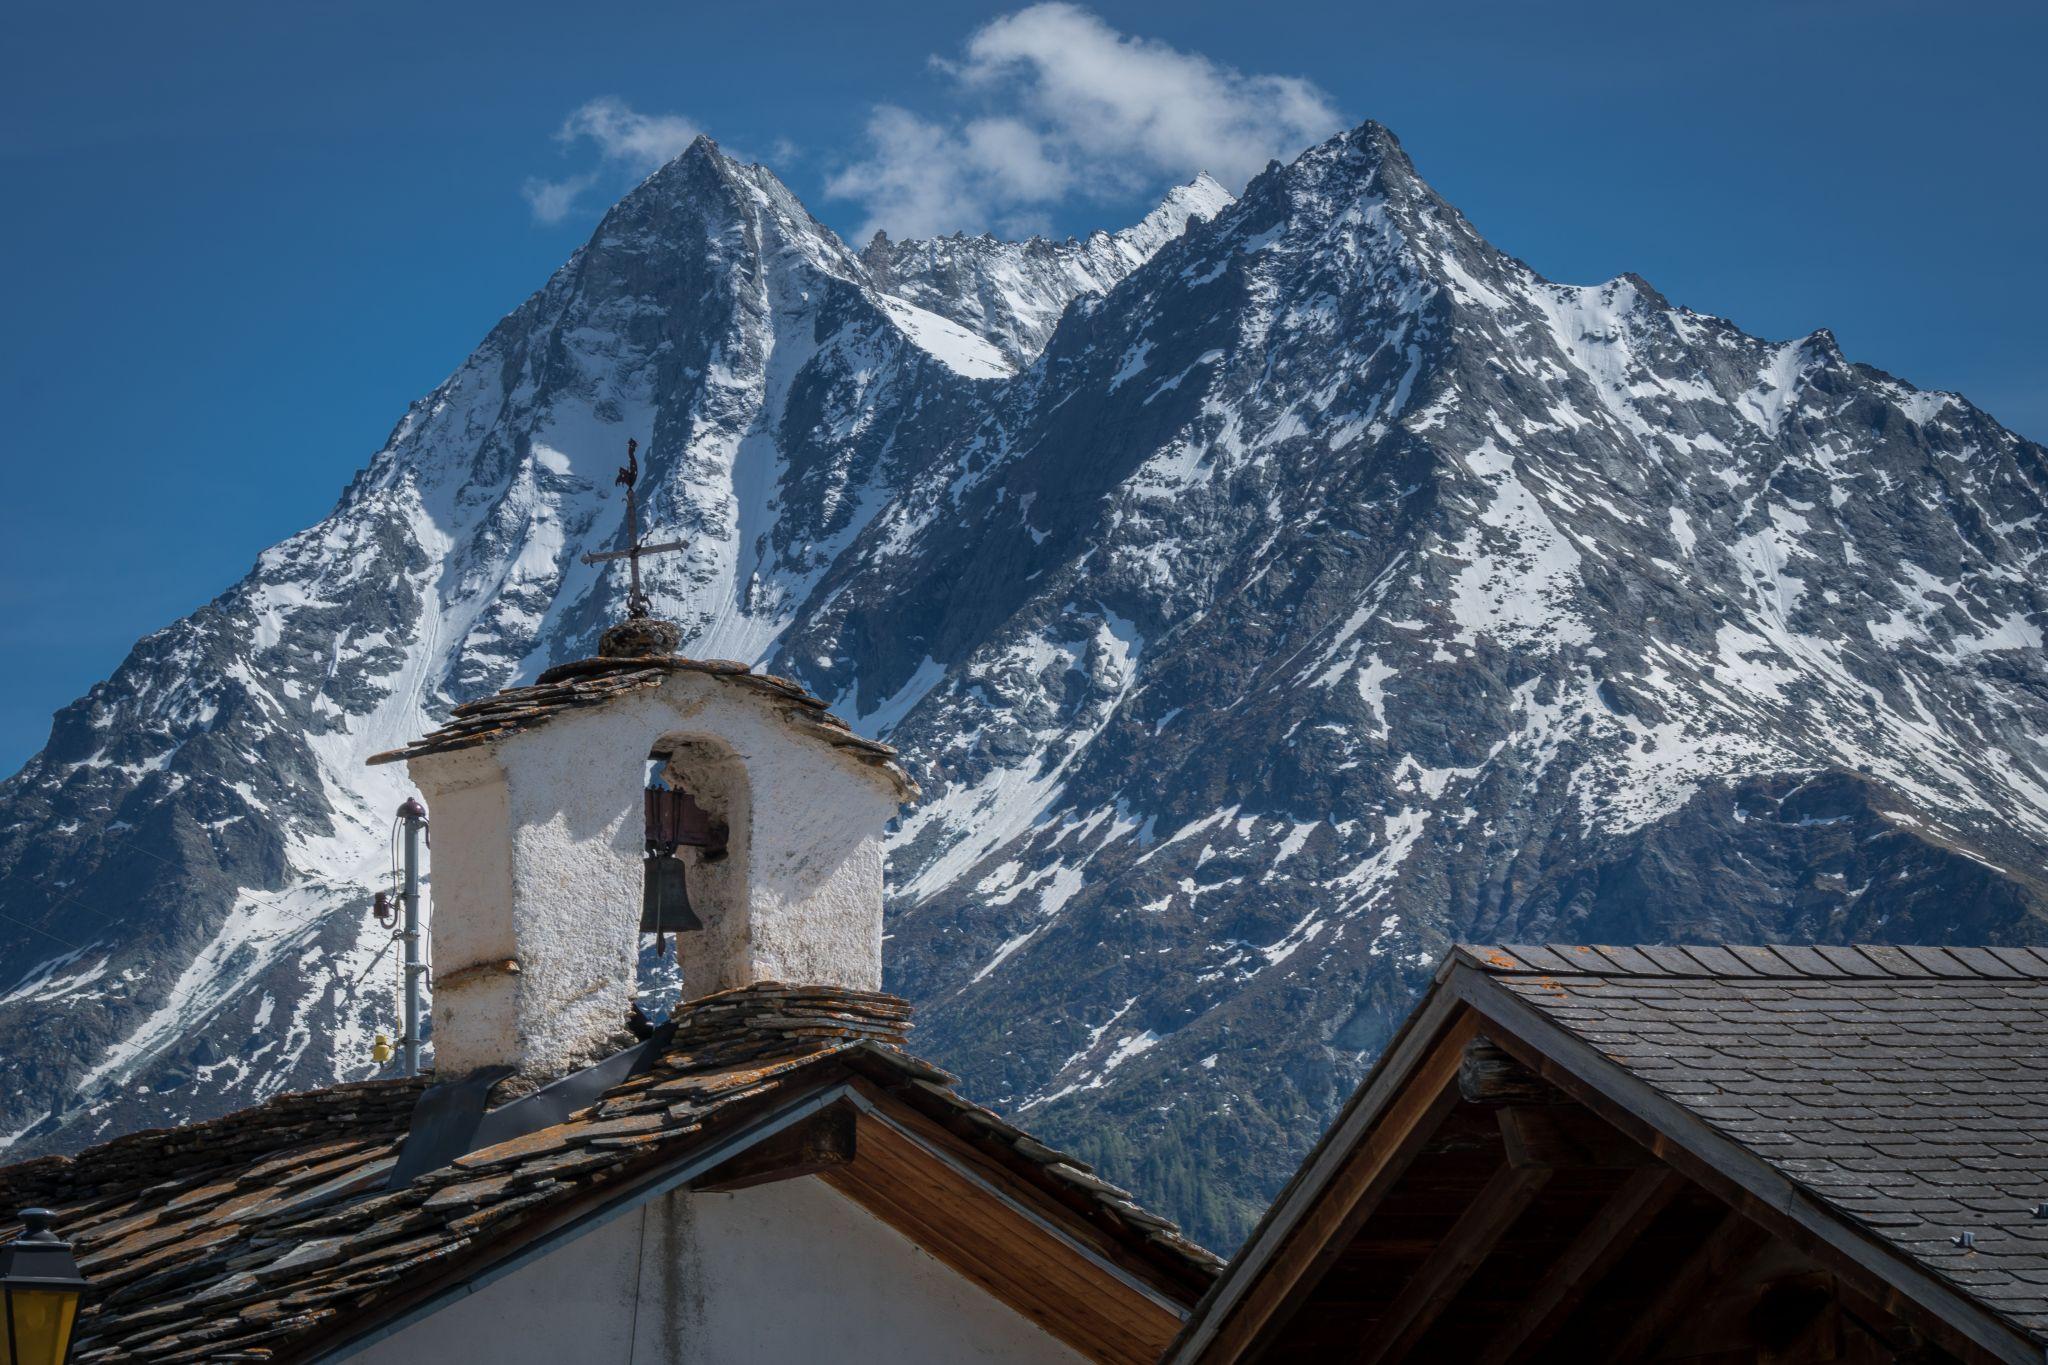 Chapelle de Villa, La Sage, Switzerland